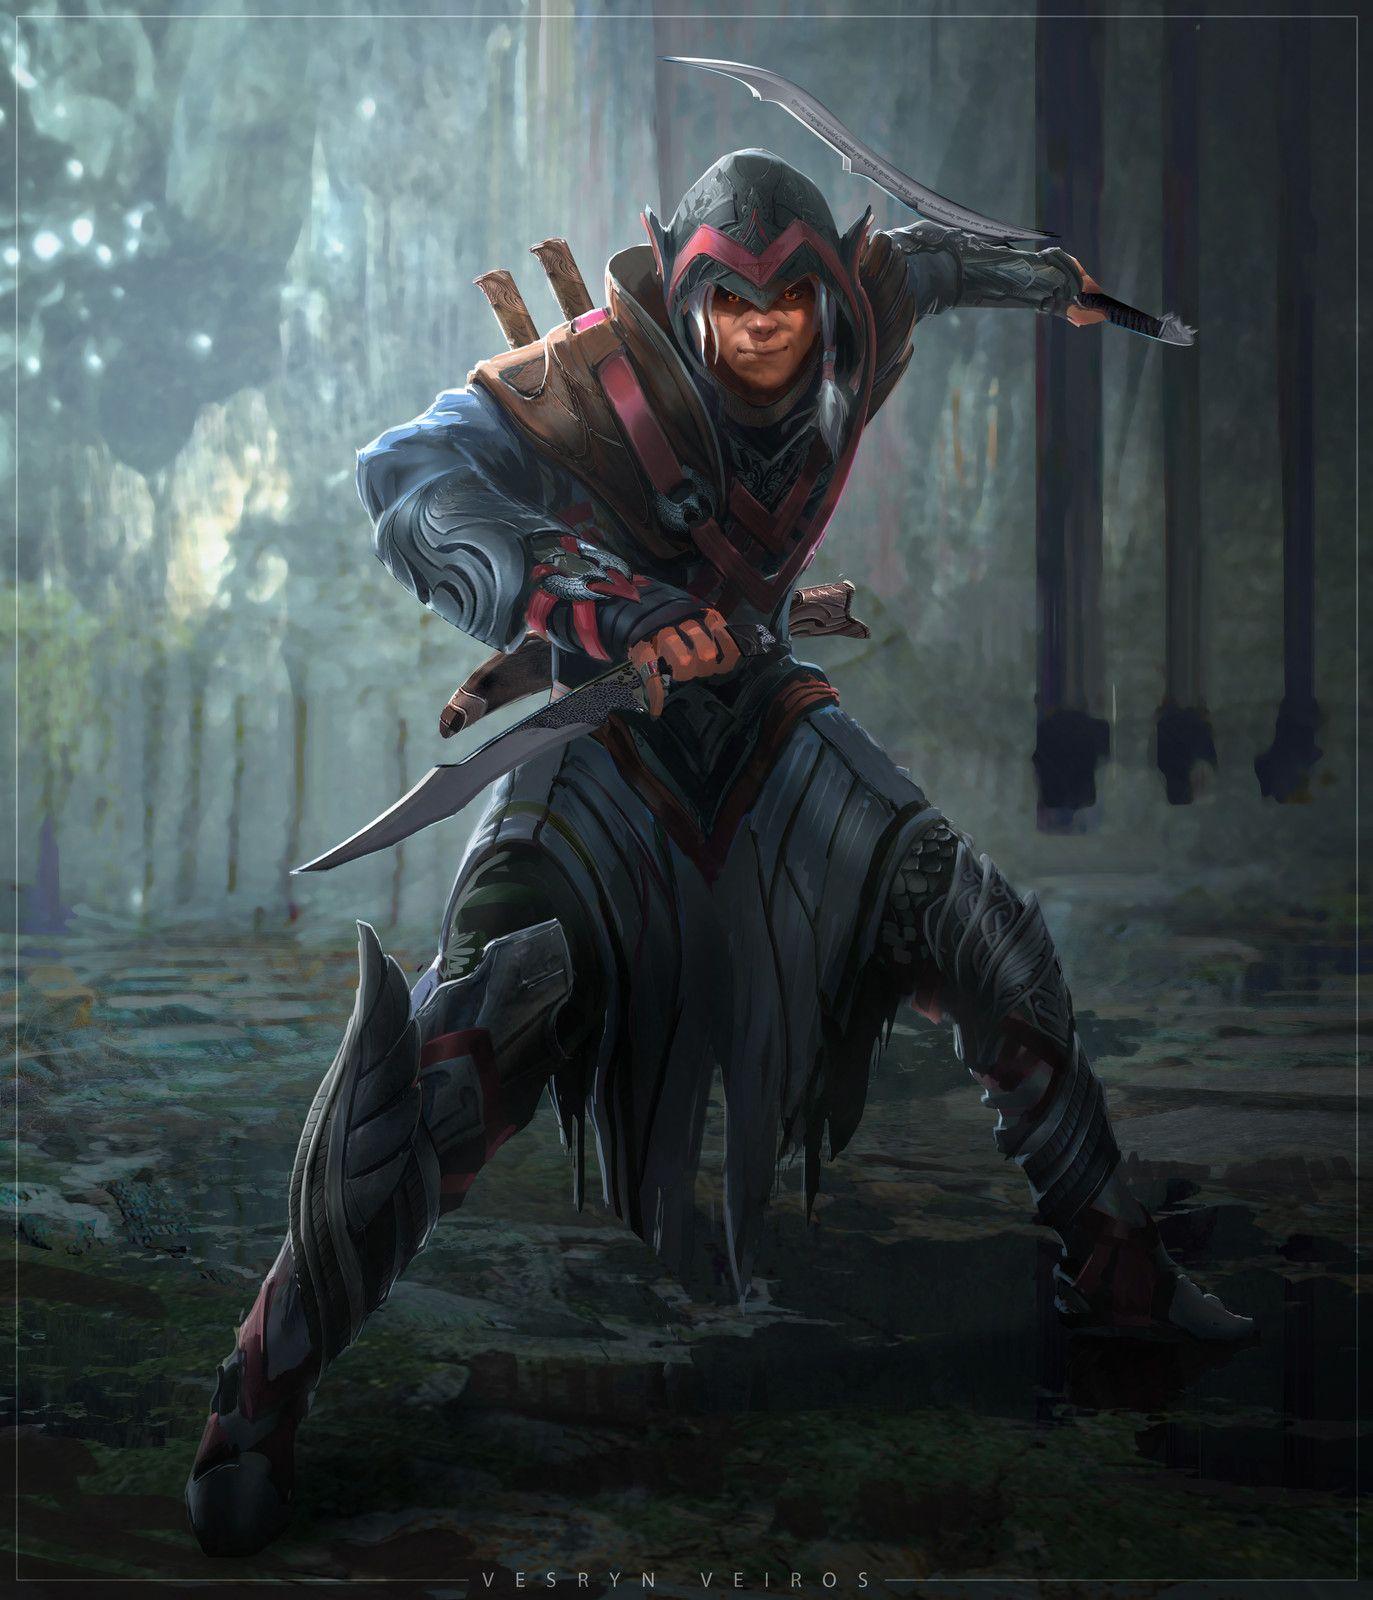 Vesryn Veiros, Kenny Vo on ArtStation at  https://www.artstation.com/artwork/1Gmb8 | Fantasy art warrior, Fantasy  character design, Dungeons and dragons characters